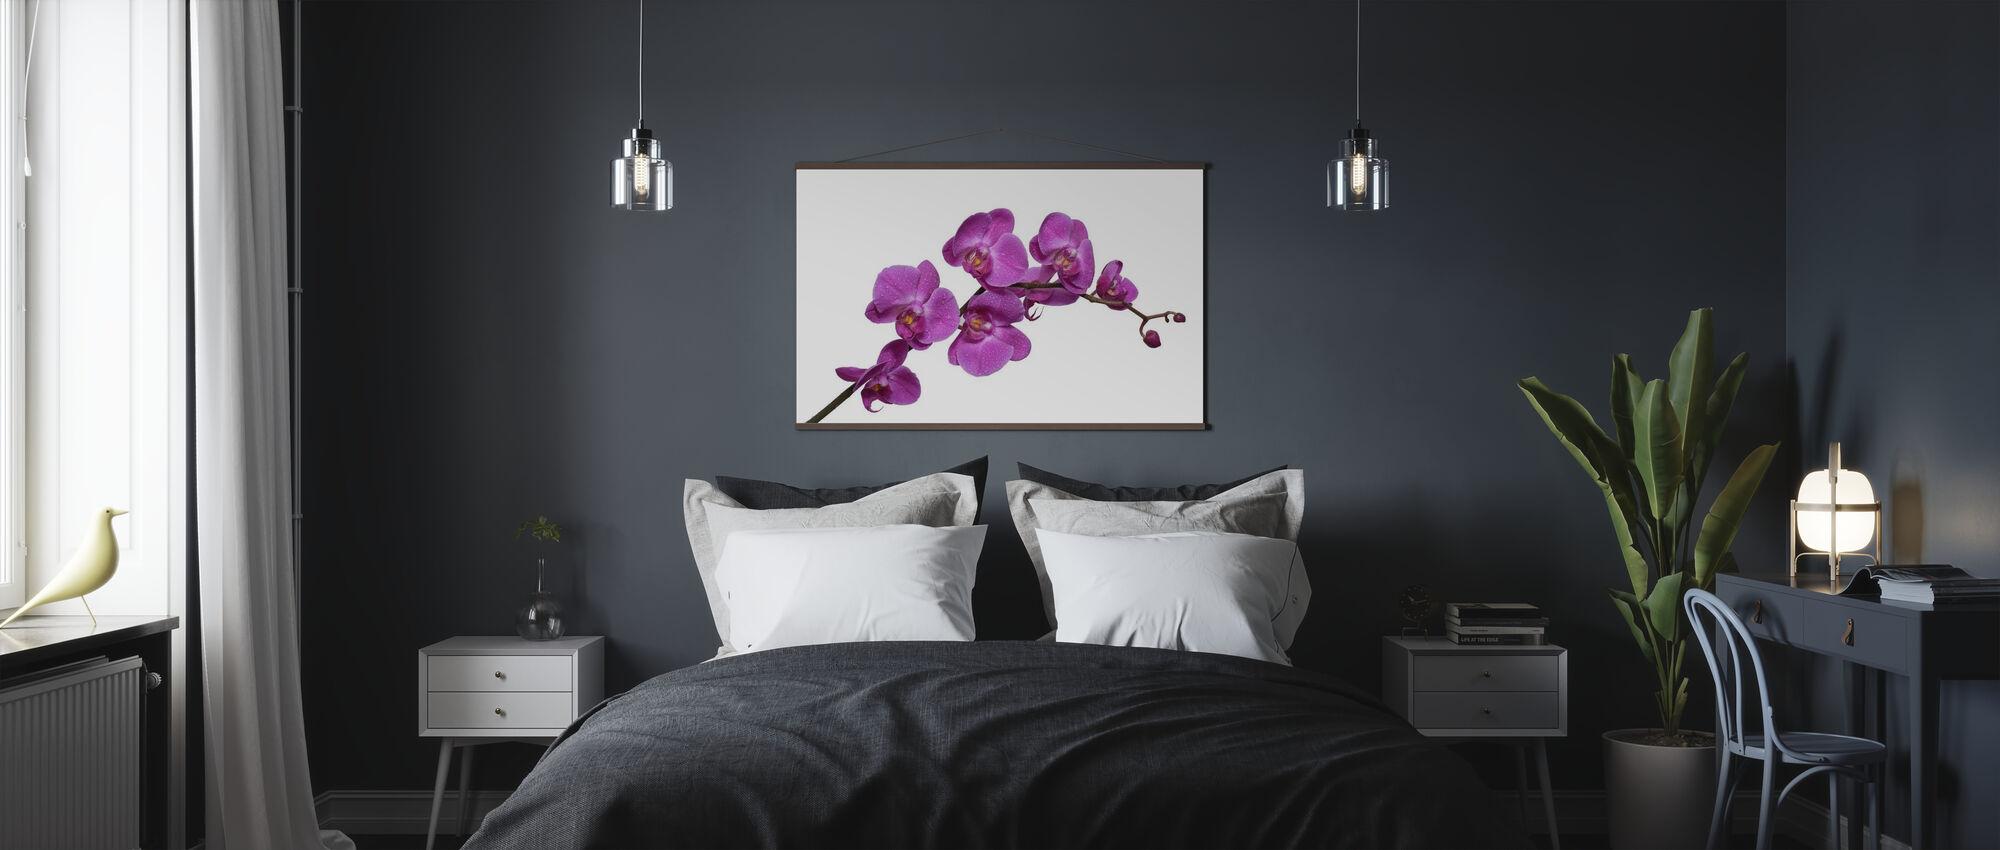 Crisp Orchids - Poster - Bedroom